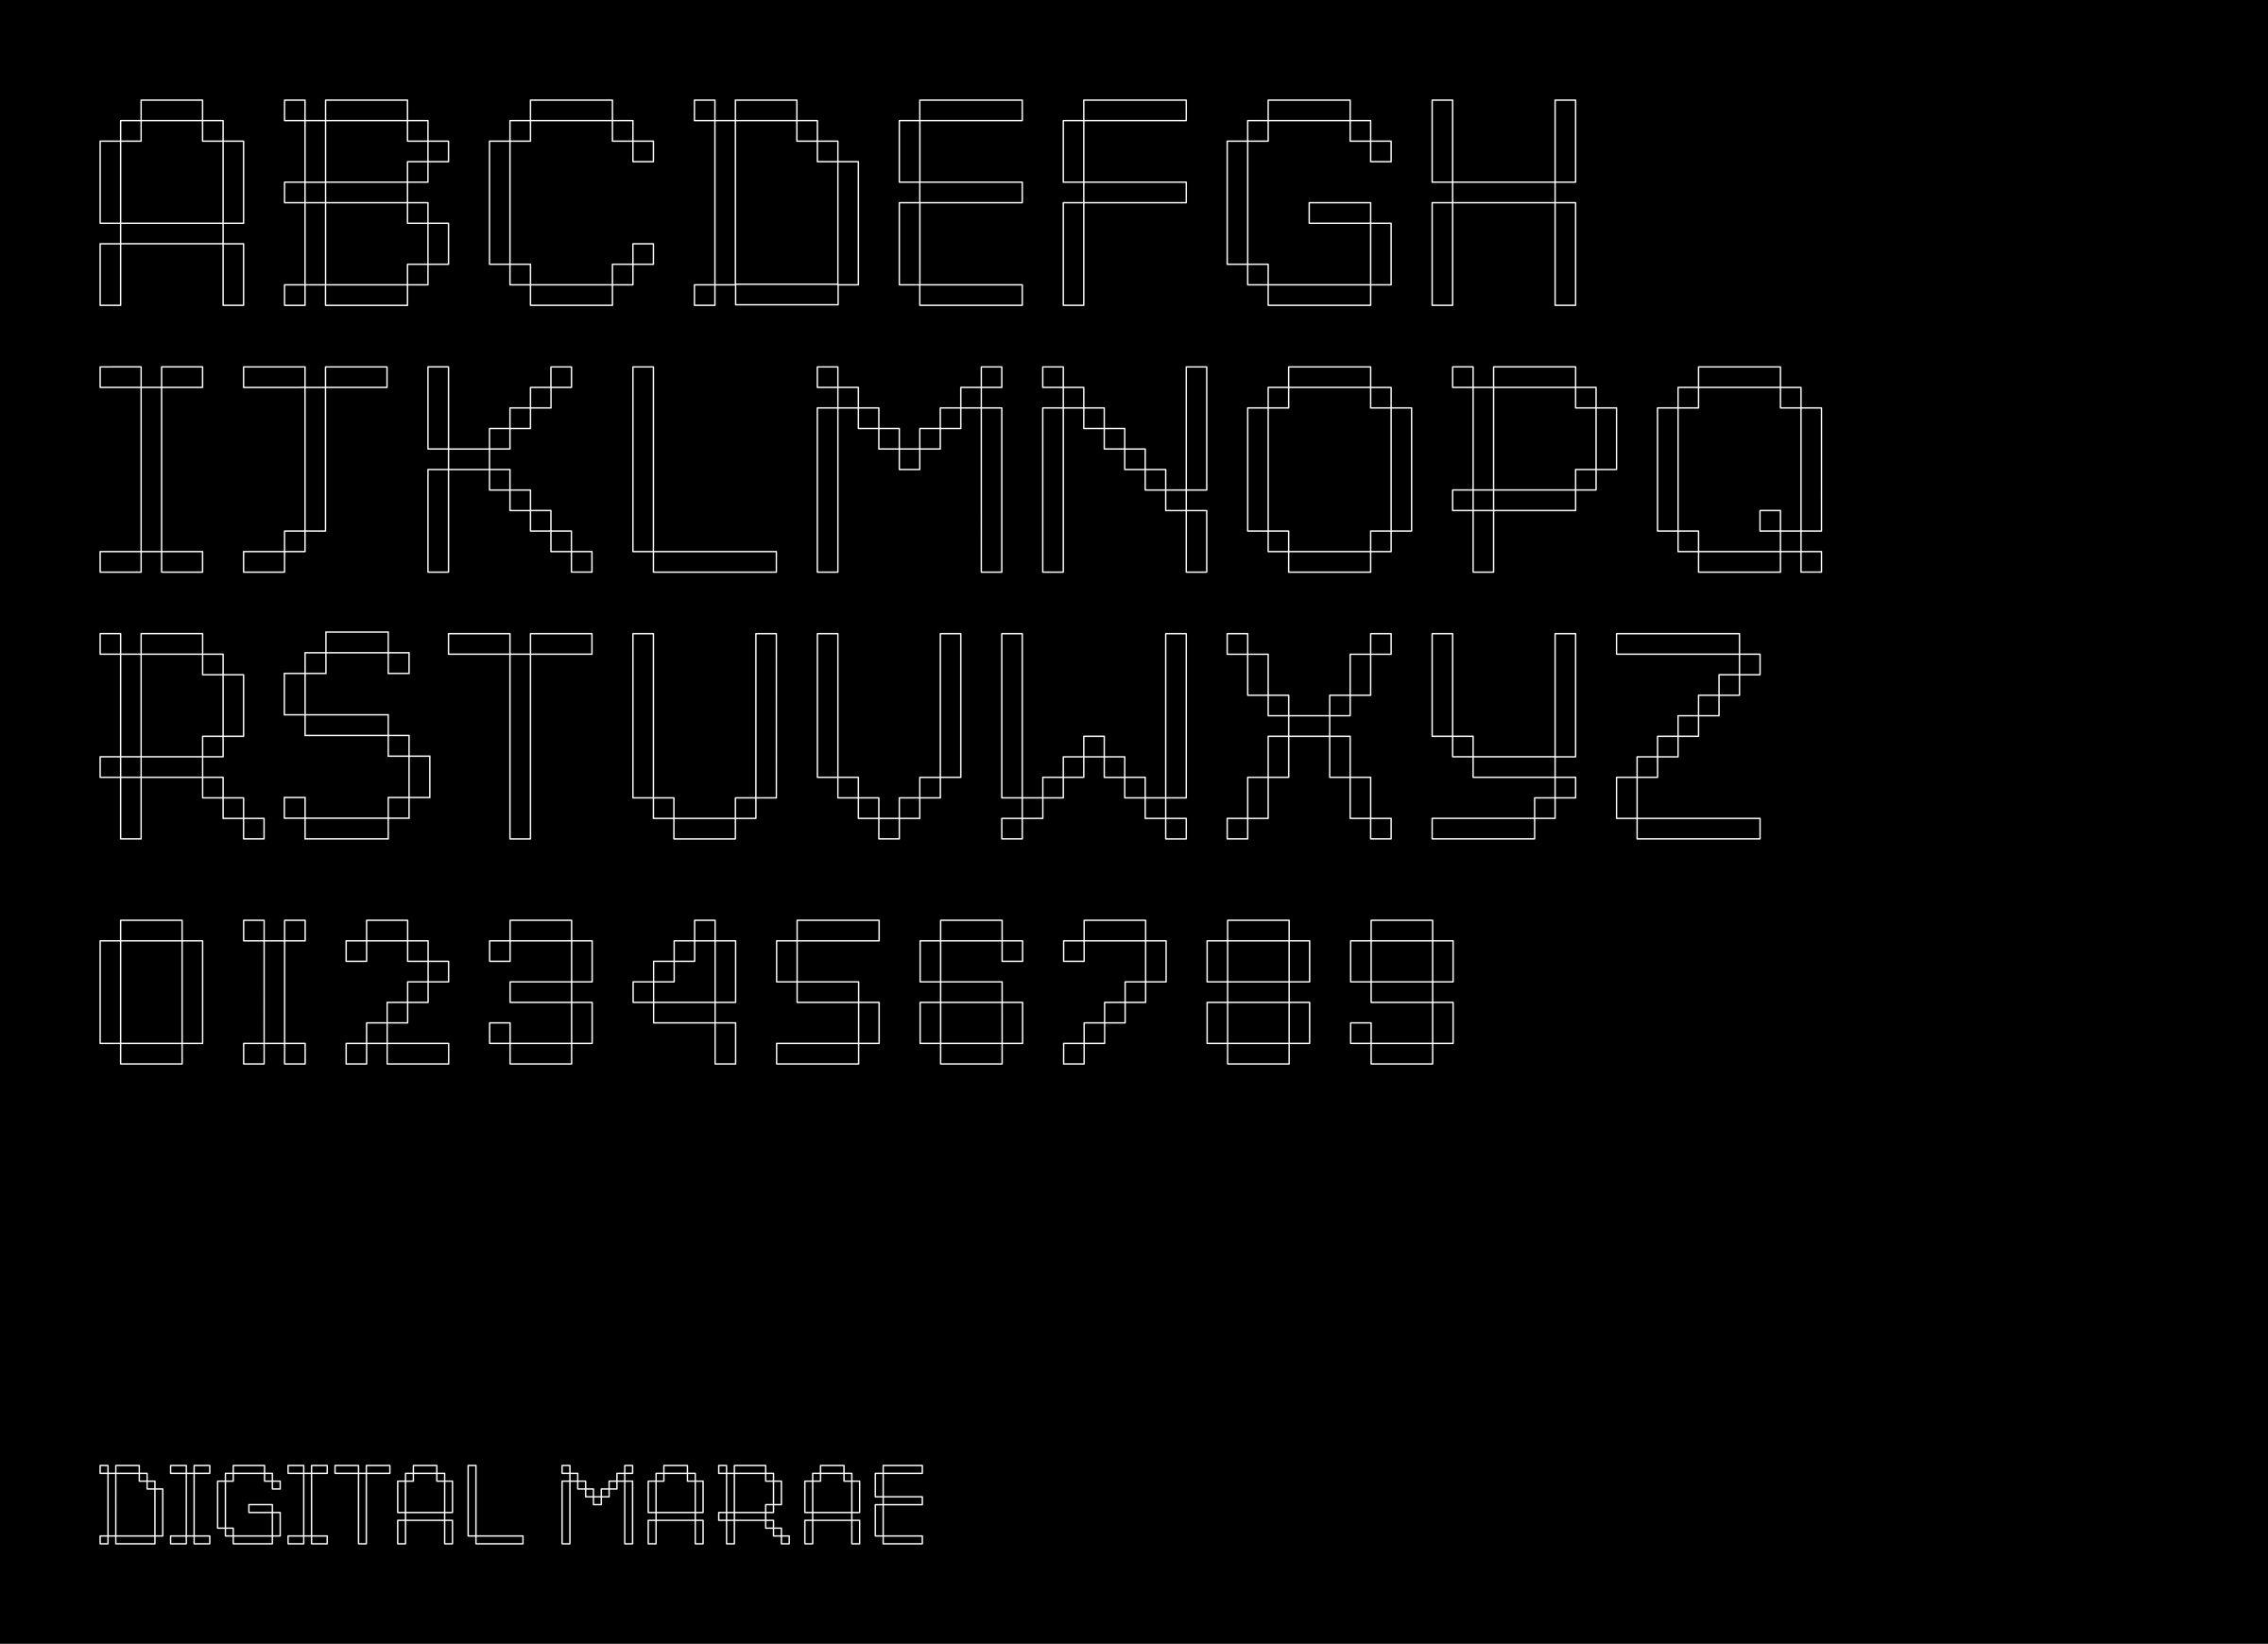 https://tanamitchell.com/wp-content/uploads/2019/01/Digital-Marae-2000x1450px-V25-2400x1740.jpg